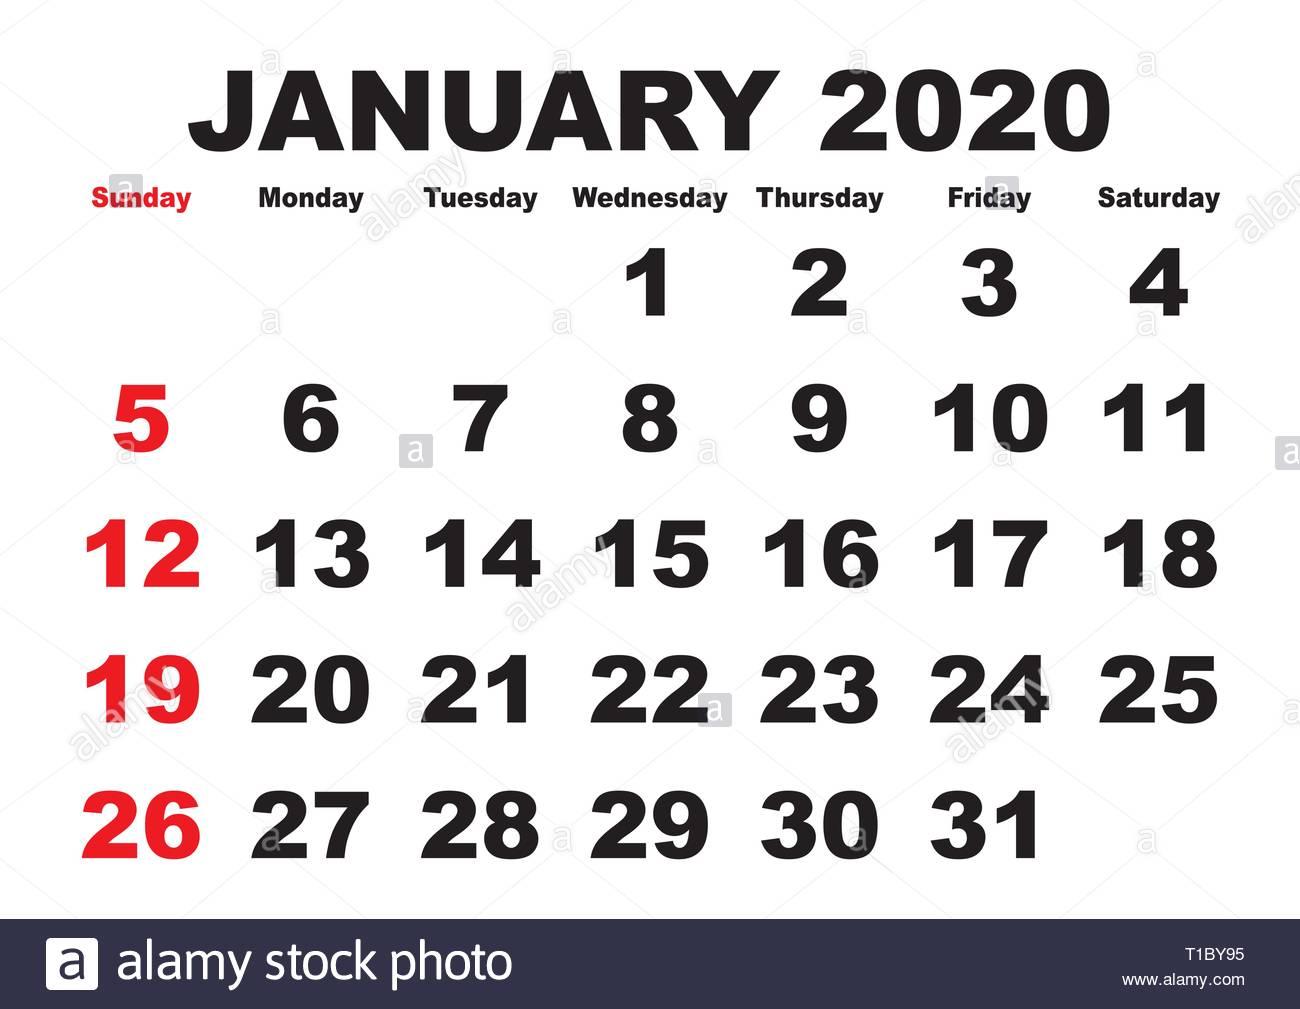 Immagini Calendario 2020 Gennaio.2020 Calendario Mese Di Gennaio Vettore Calendario